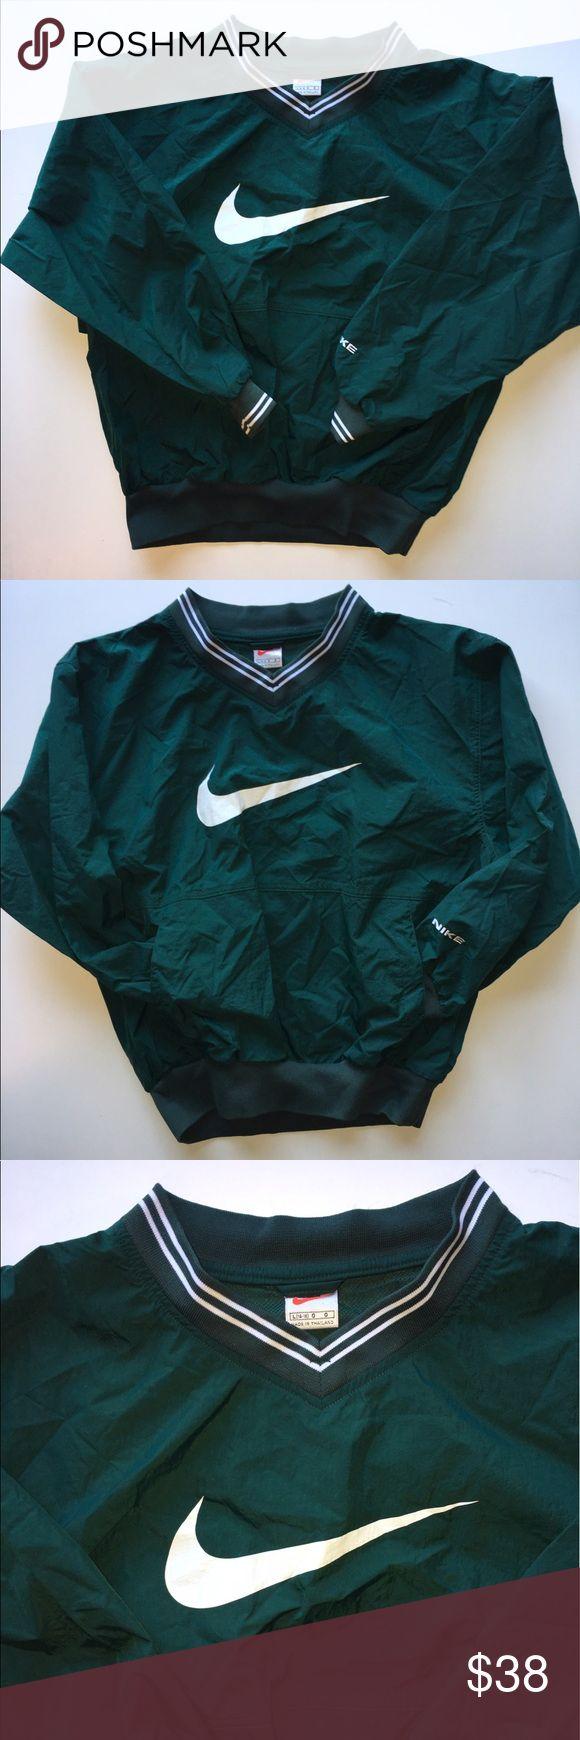 Vintage Nike Forest Green Pullover Vintage Nike Forest Green Pullover Size Large in perfect condition! Nike Jackets & Coats Windbreakers